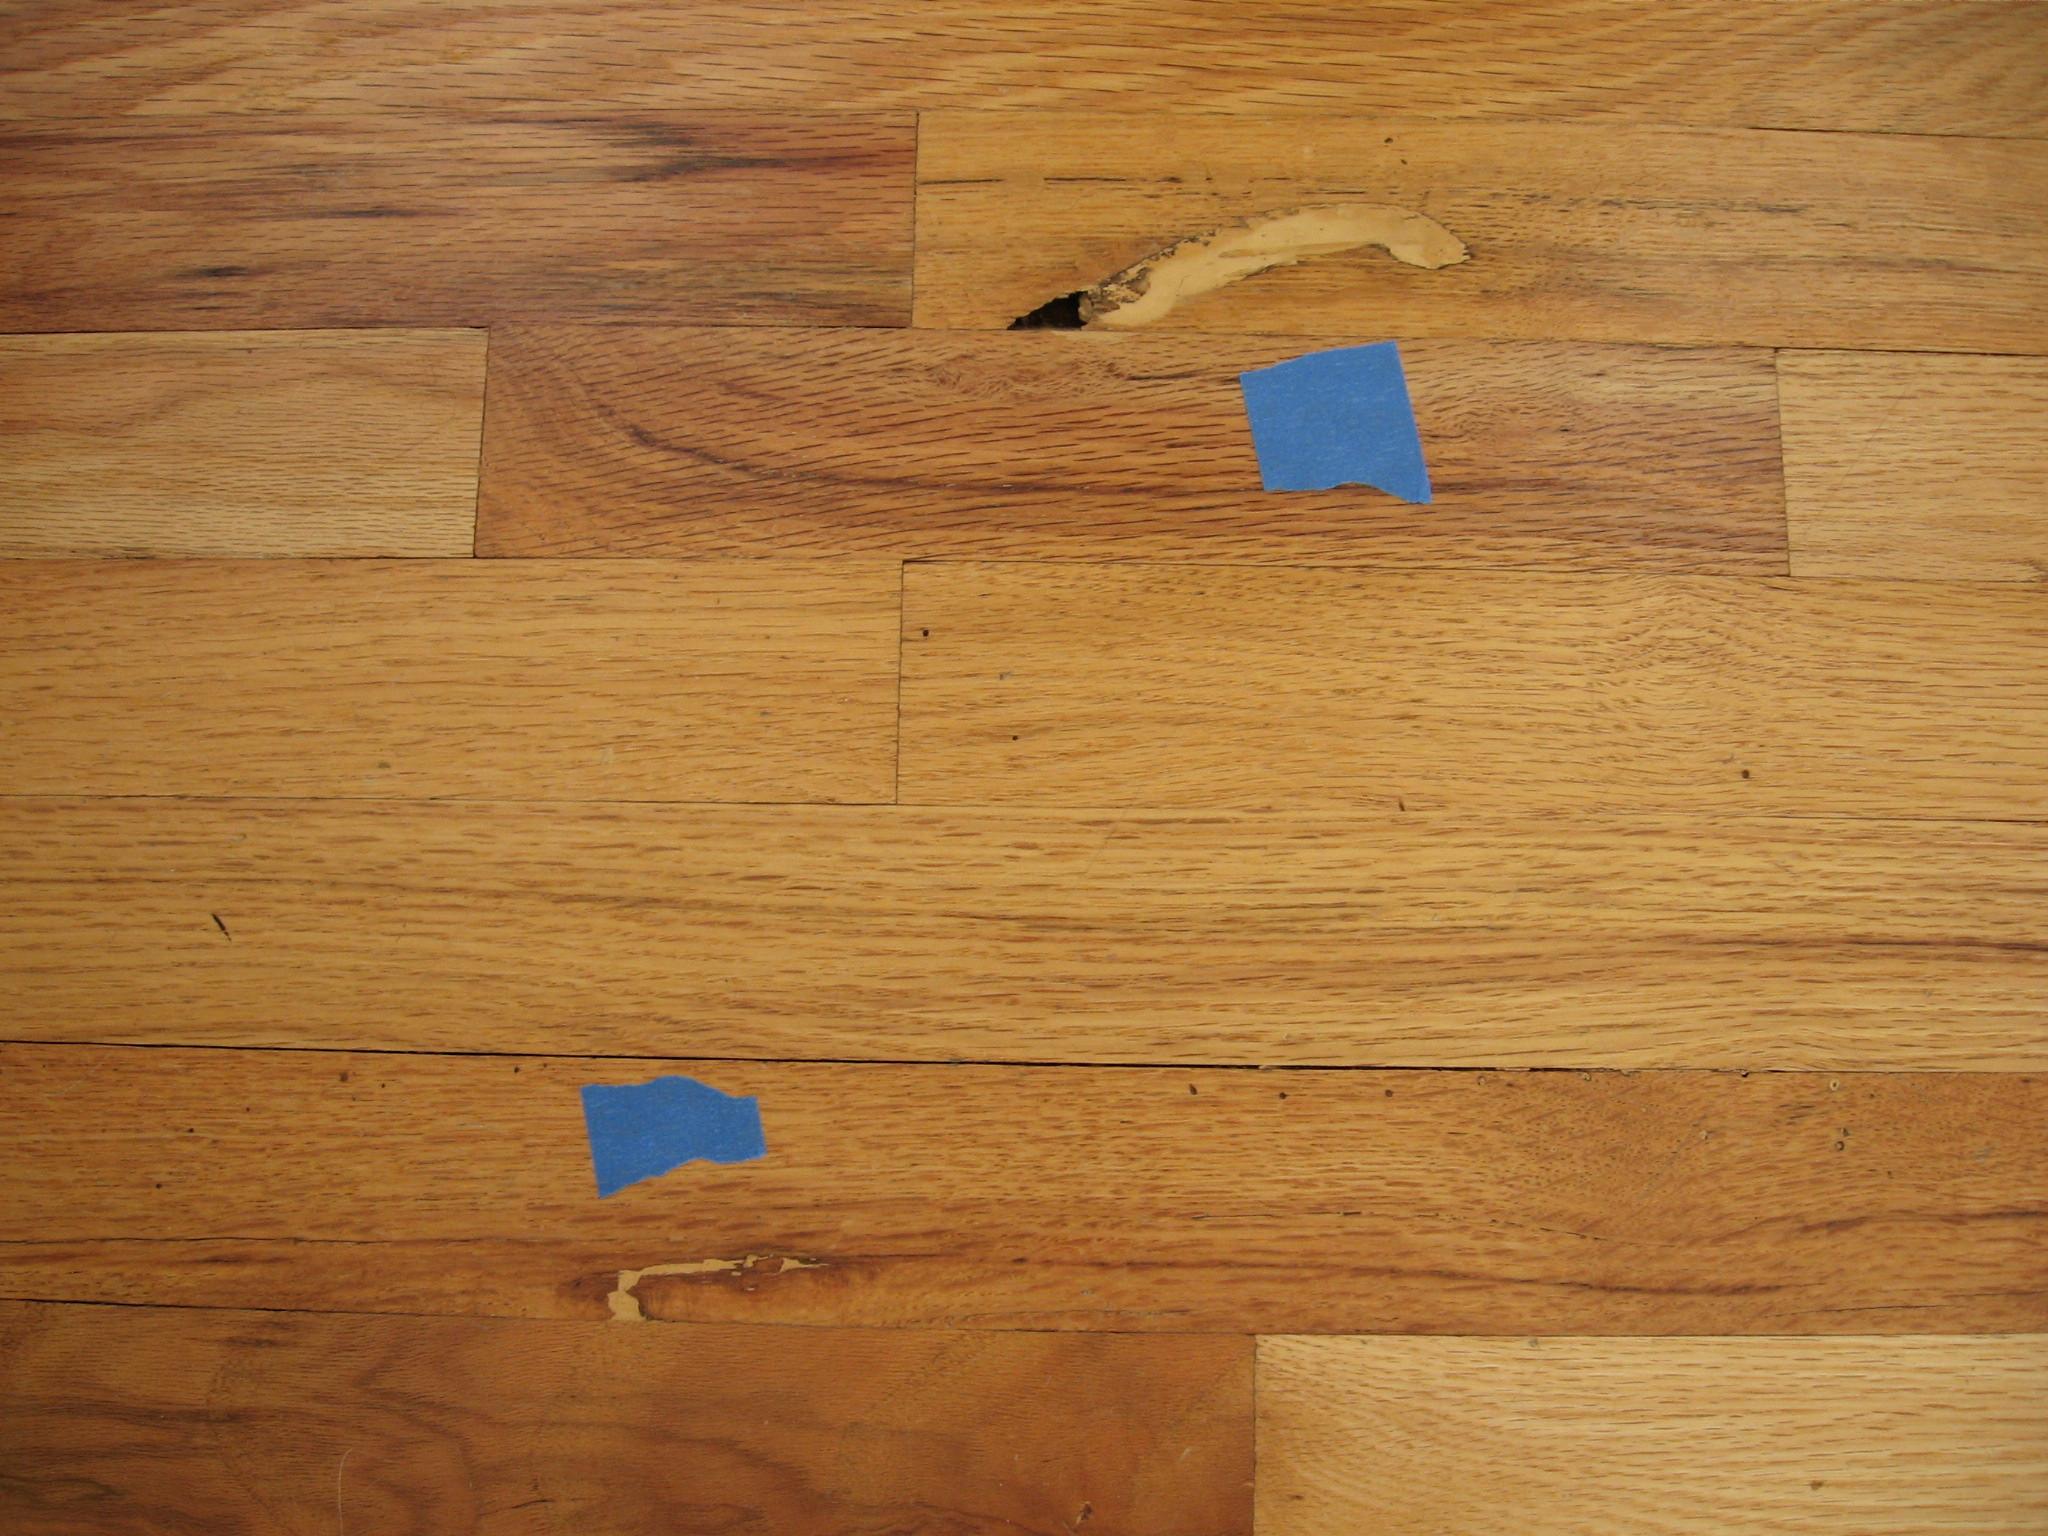 discount hardwood flooring utah of hardwood floor installation archives wlcu intended for hardwood floor repair near me best of wood floor techniques 101 category floor tags hardwood